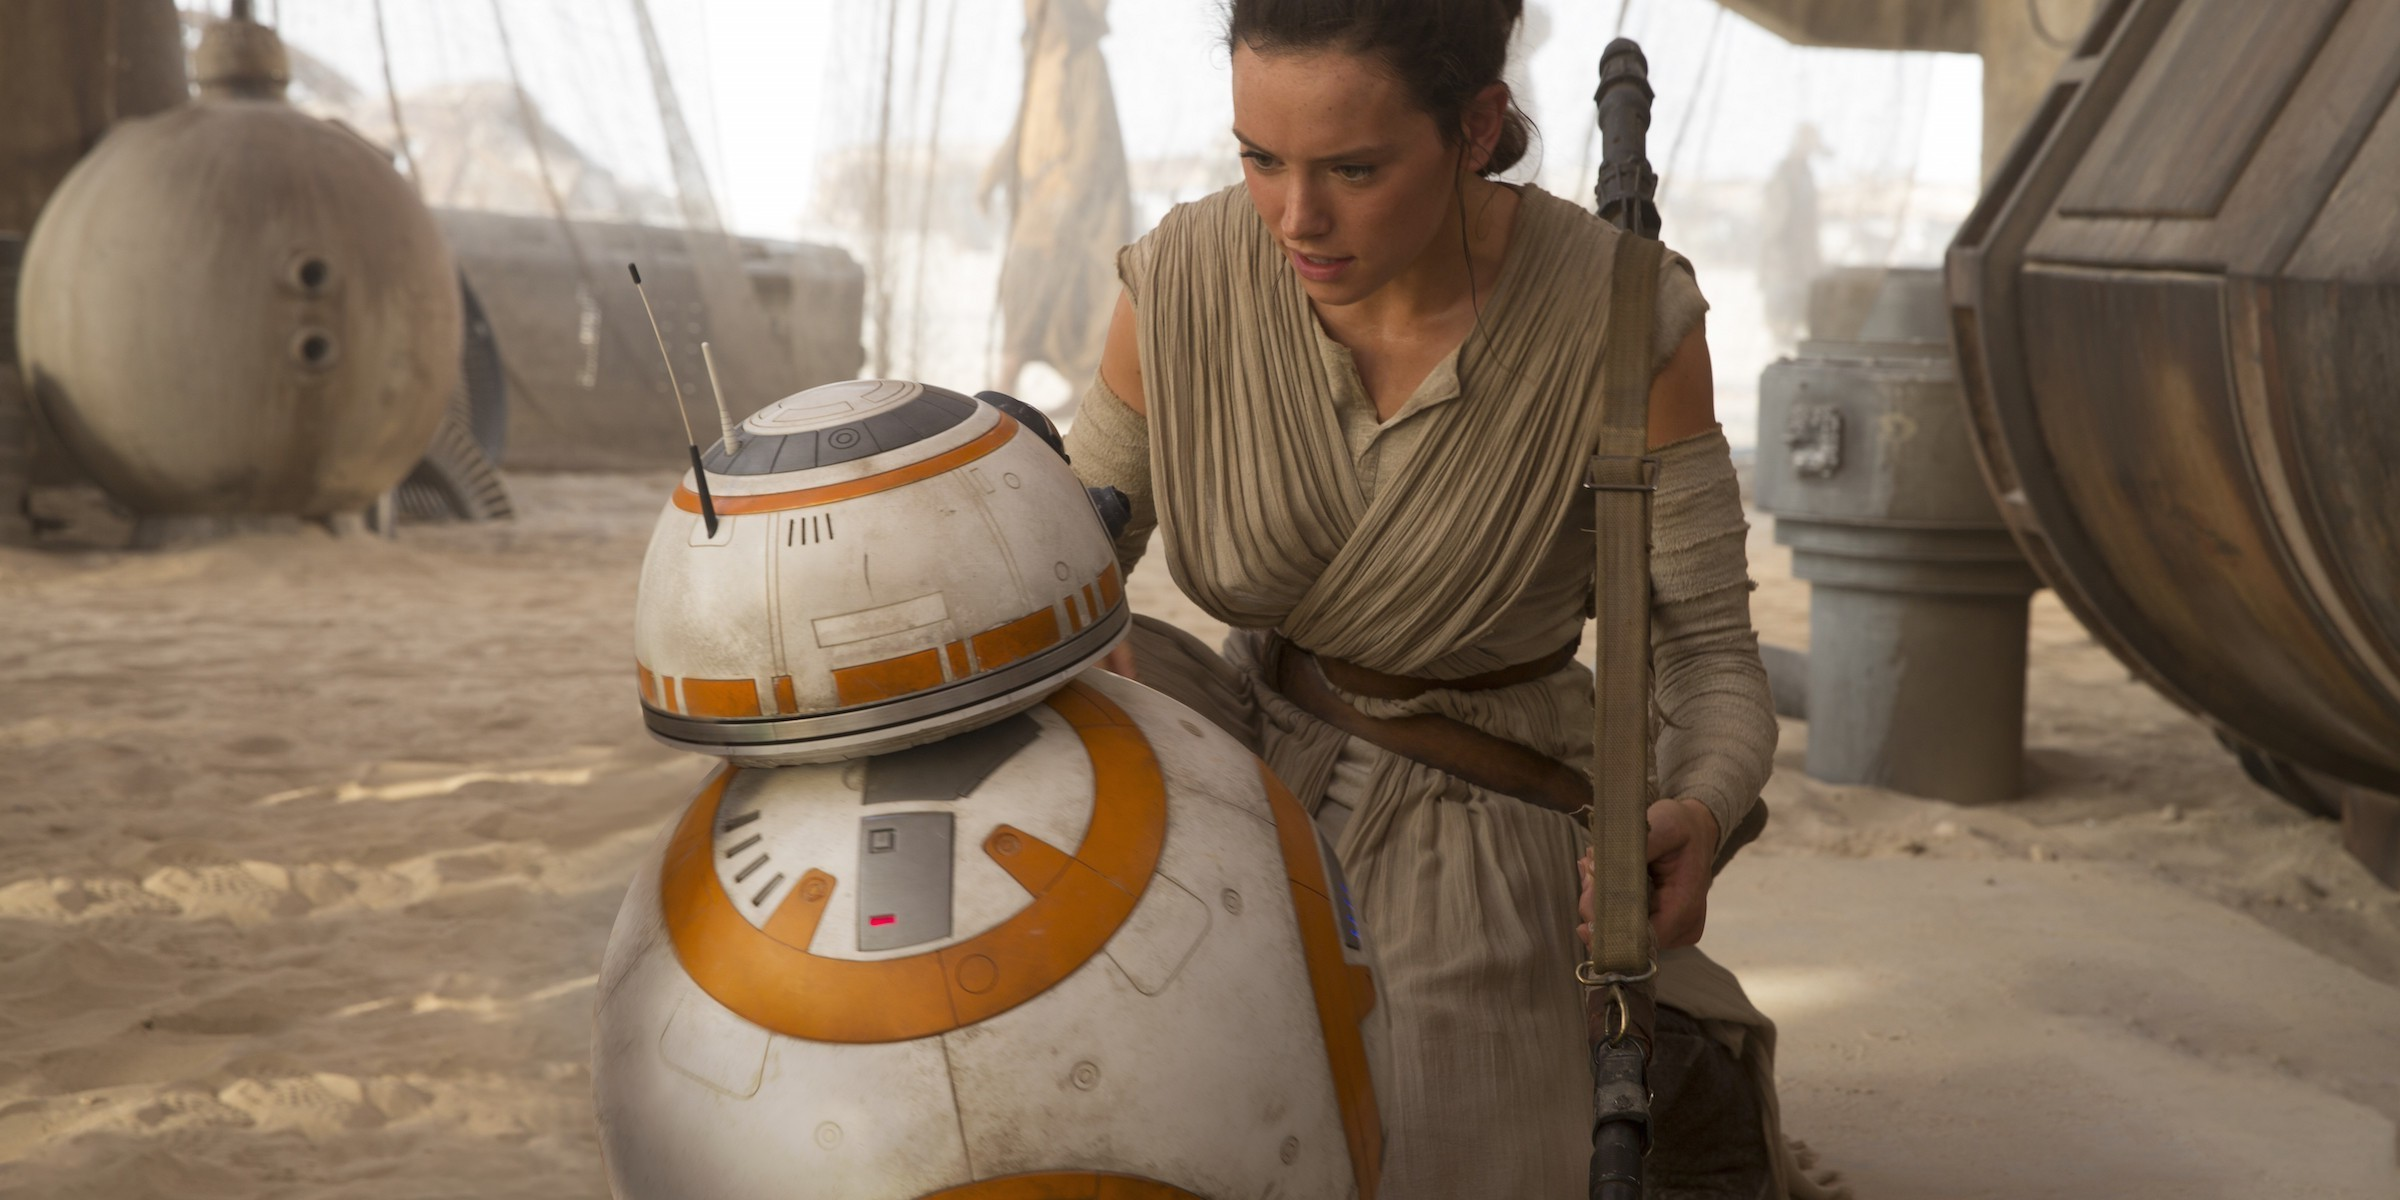 Star Wars, Star Wars: Episode VII The Force Awakens, Jakku, Rey (from Star  Wars), Desert, BB 8 Wallpapers HD / Desktop and Mobile Backgrounds